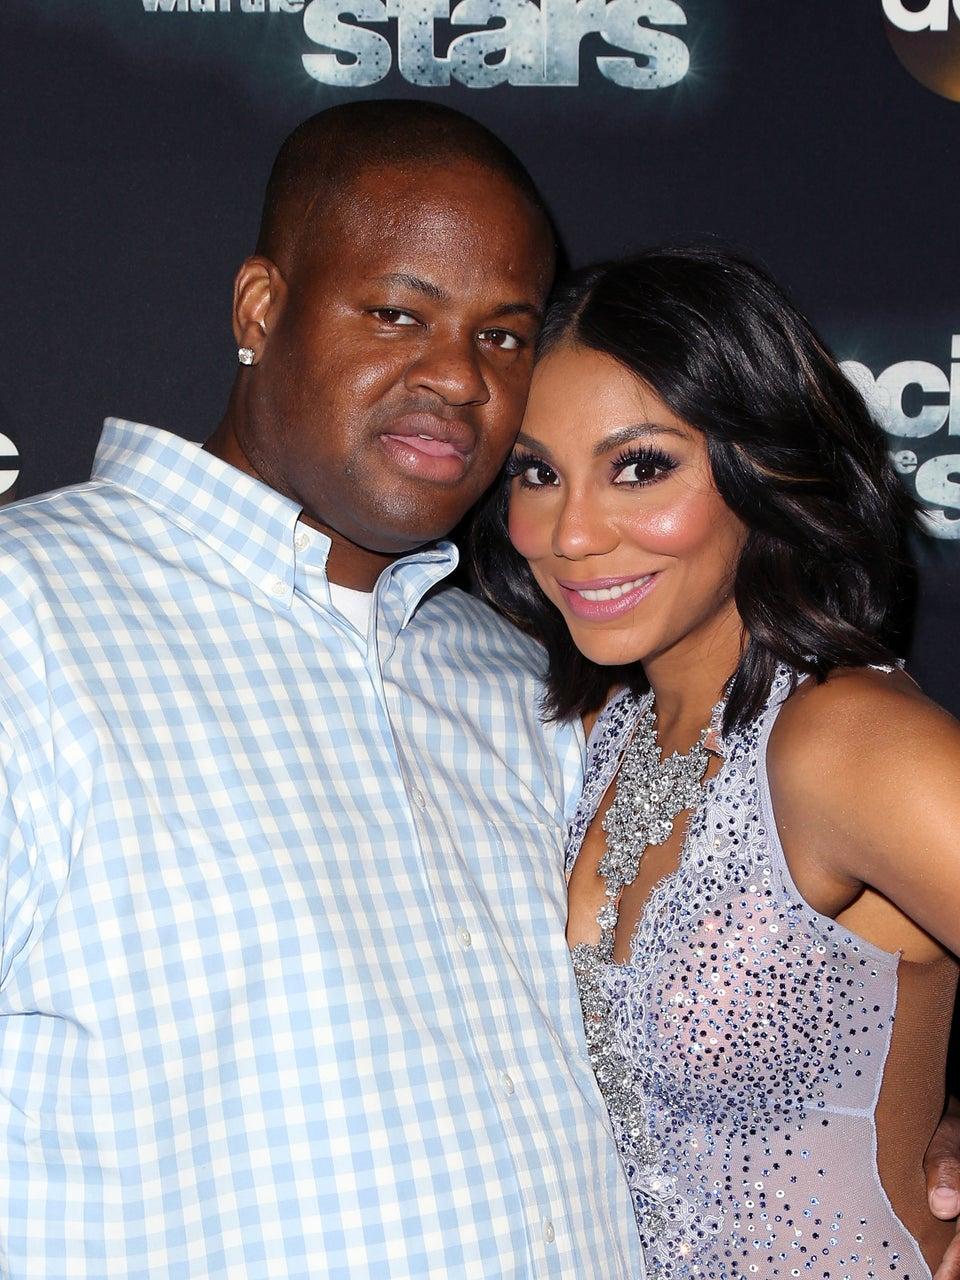 What Divorce? Tamar and Vince Shut the Rumors Down